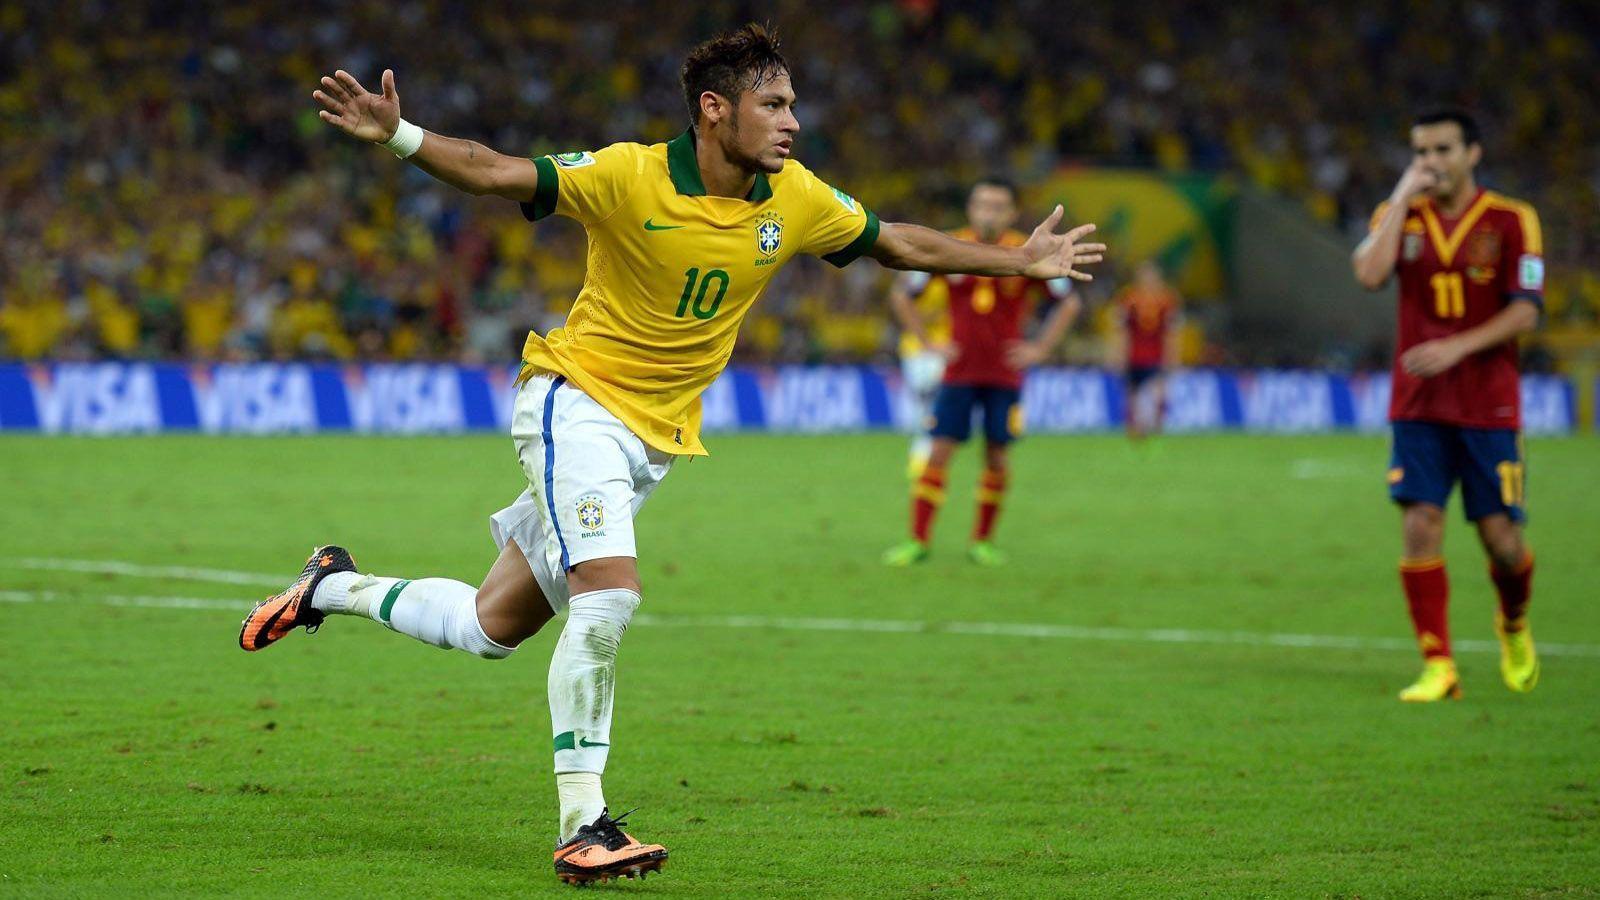 Neymar brazil wallpapers 2017 wallpaper cave - Neymar brazil hd ...